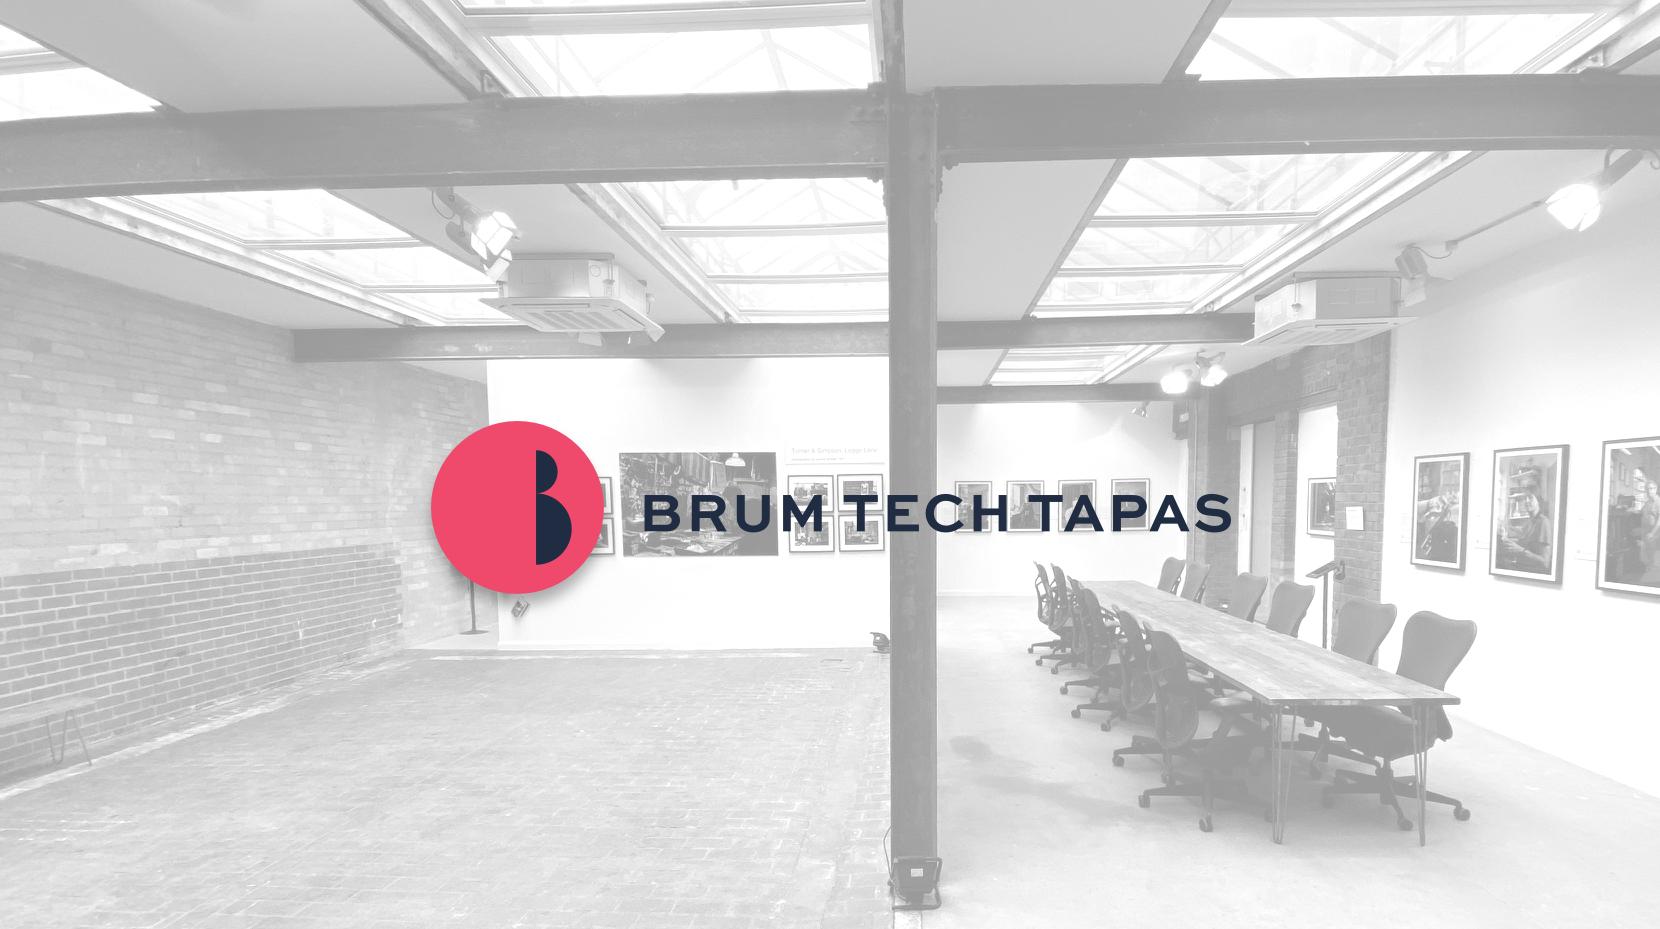 Brum Tech Tapas: A Retrospective (BRUM)